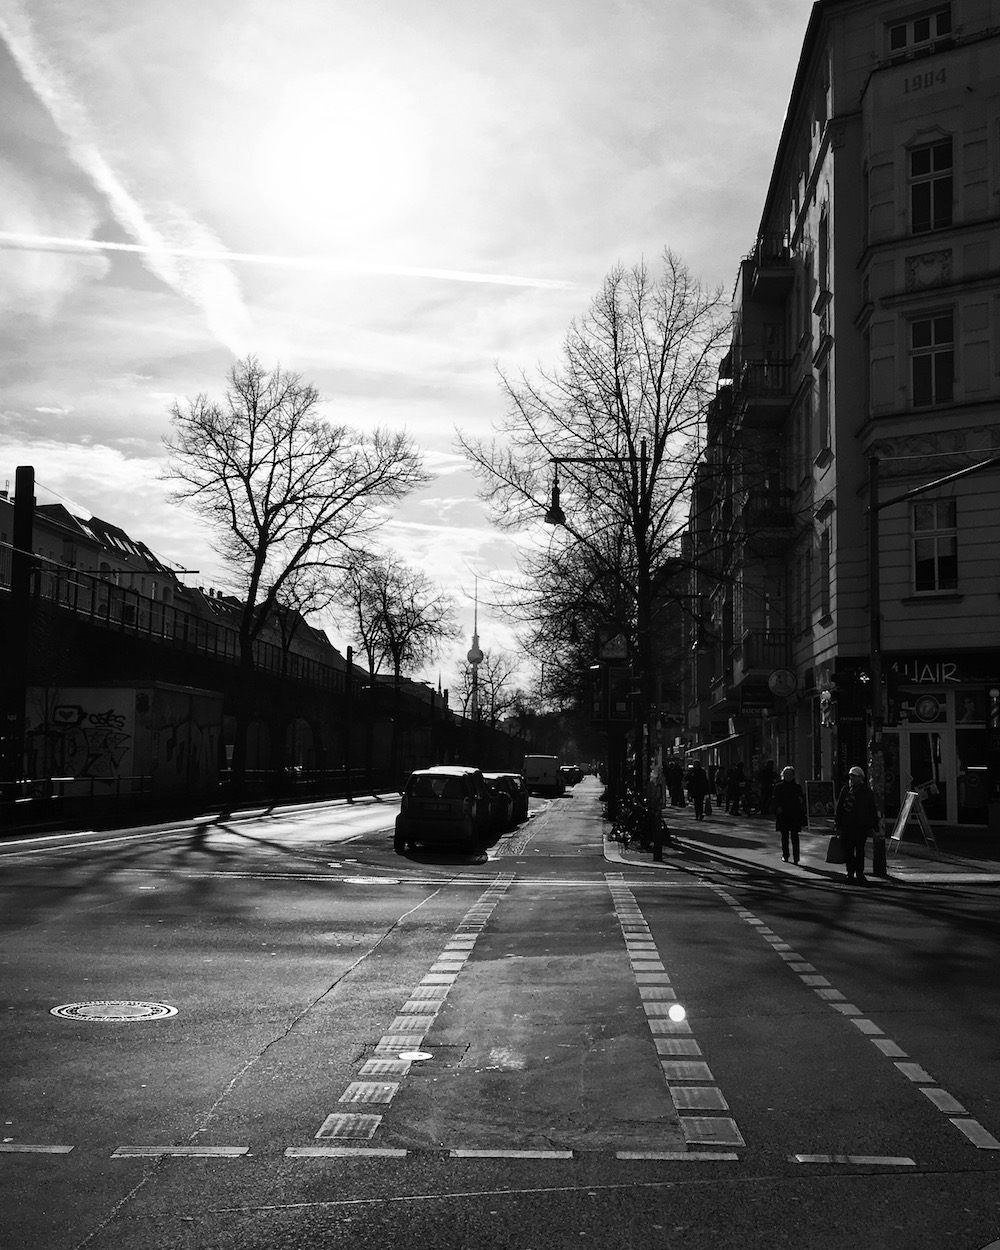 berlin-ick-liebe-dir-instagram-berlin-foto-kw-5-2016